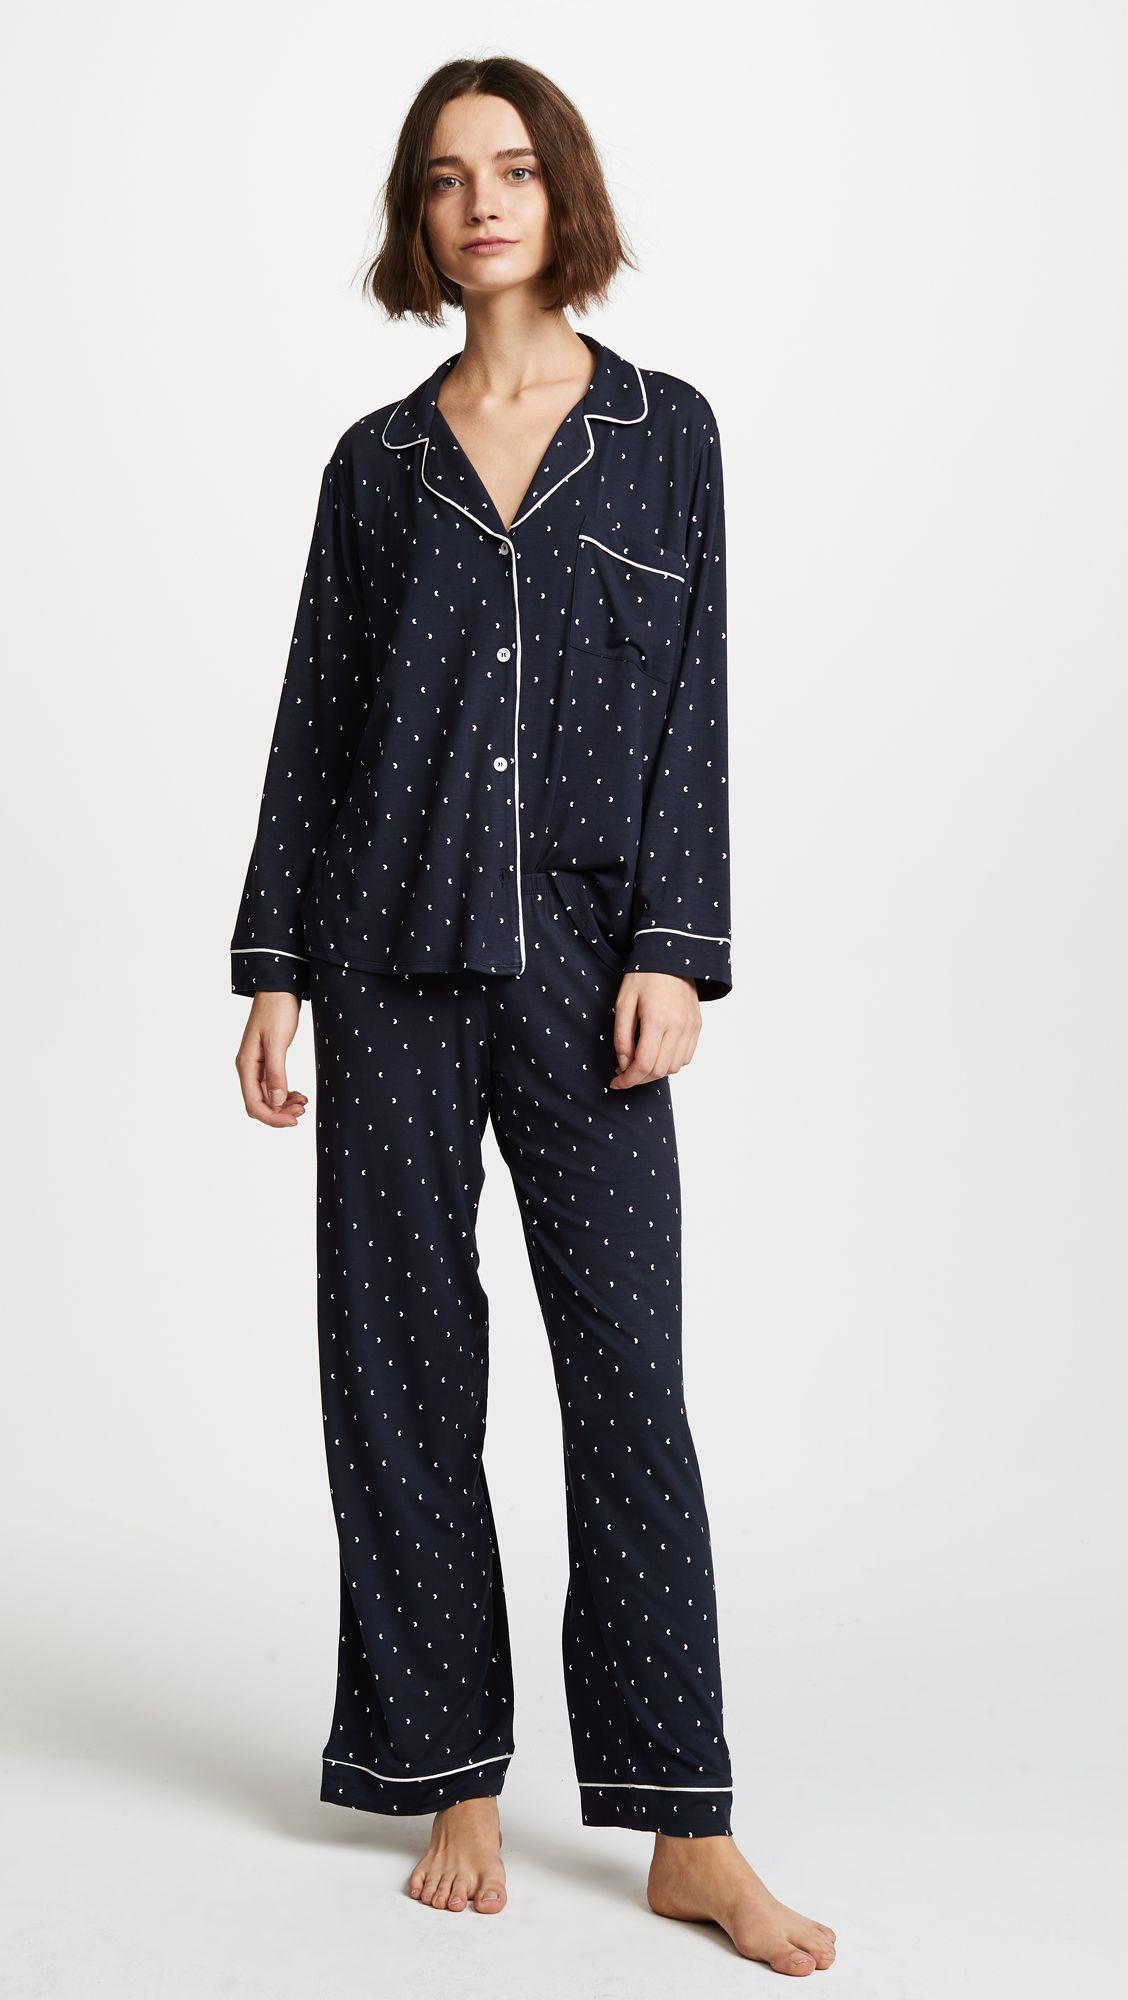 Sleep Chic Long PJ Set   Pj and Pyjamas e4e6e3f275d